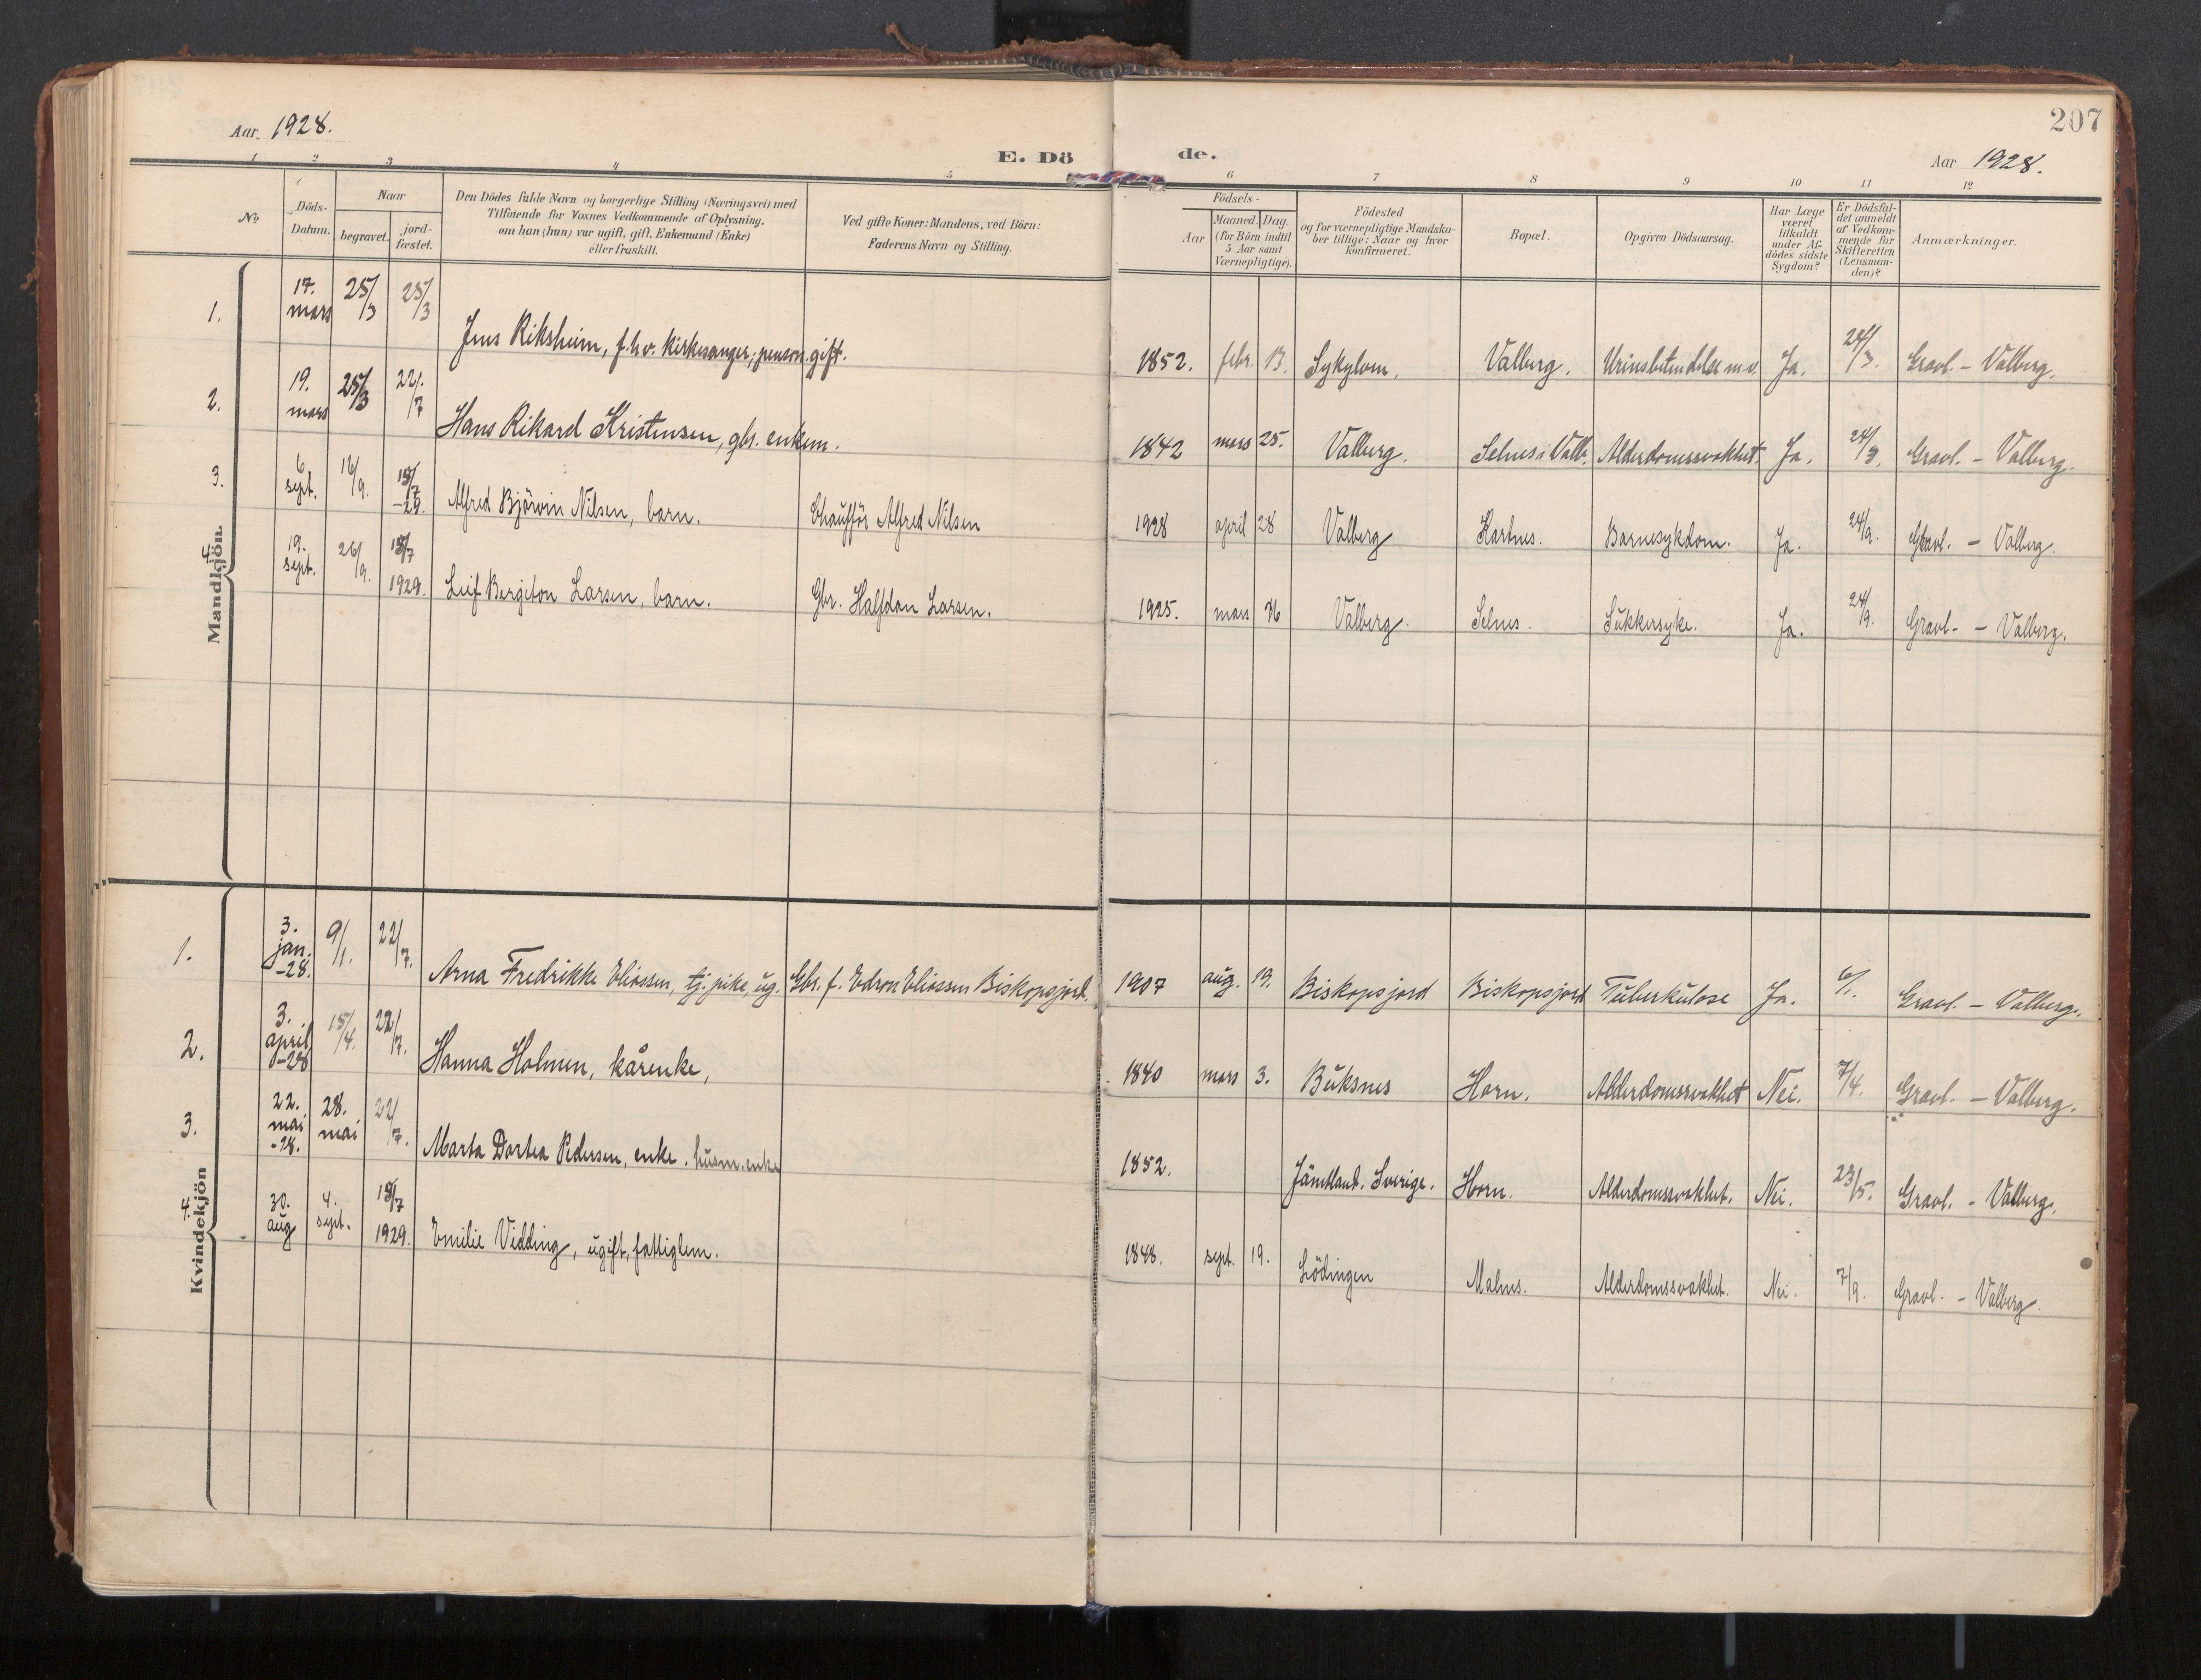 SAT, Ministerialprotokoller, klokkerbøker og fødselsregistre - Nordland, 884/L1194: Ministerialbok nr. 884A02, 1906-1937, s. 207